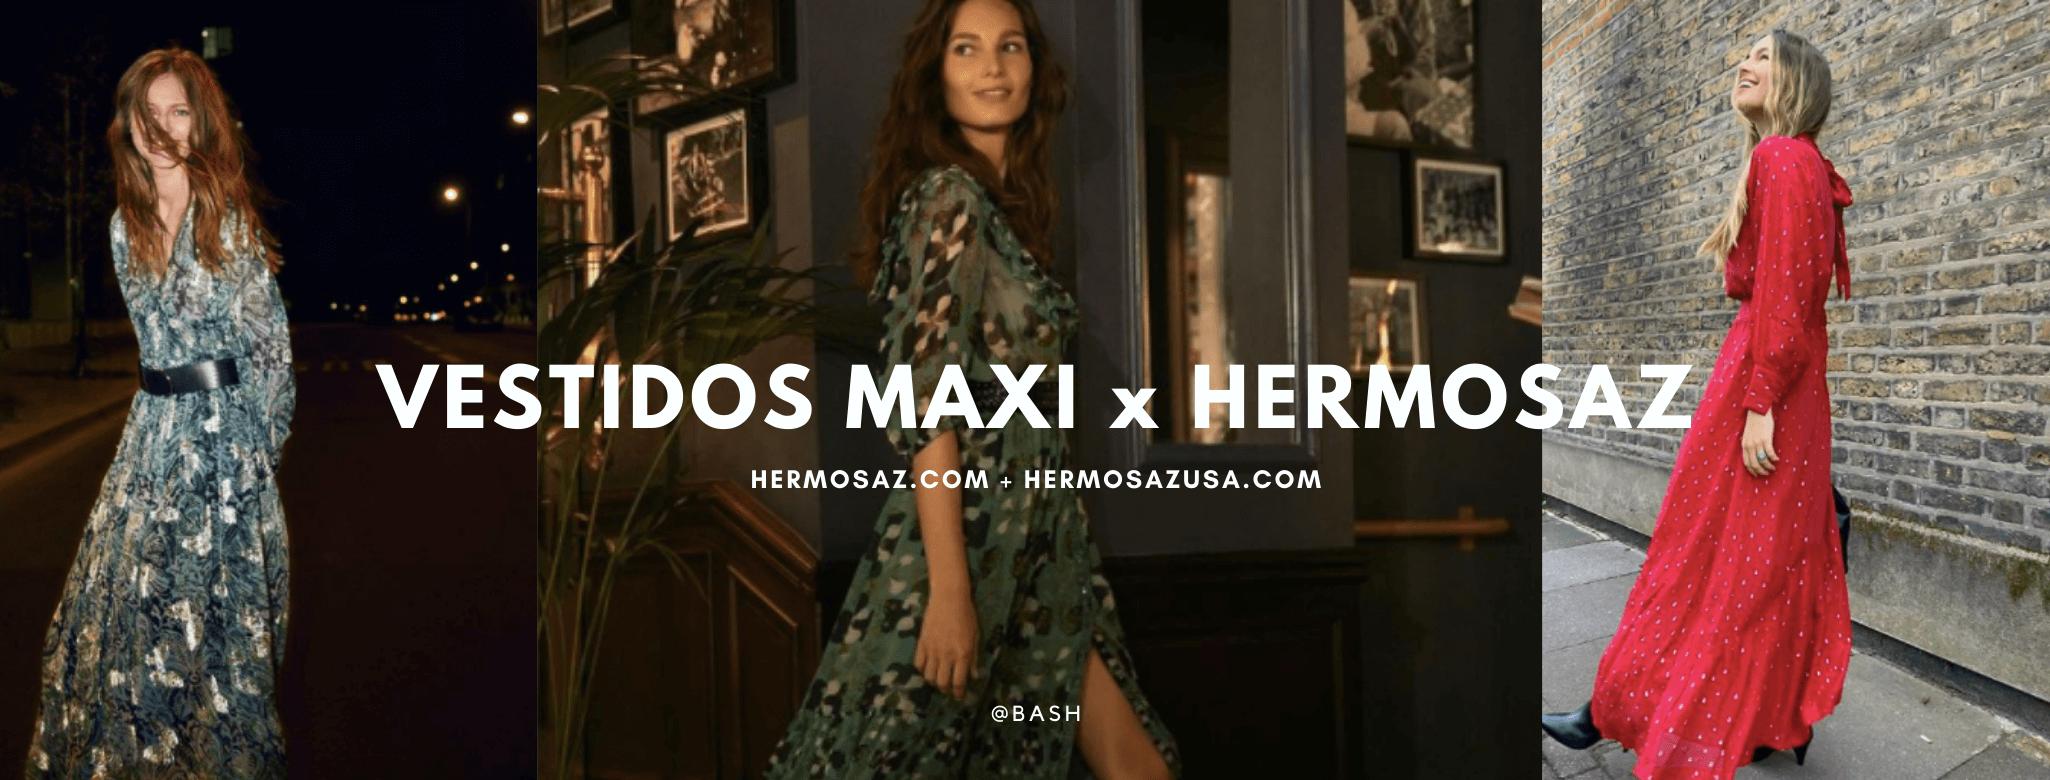 Vestidos maxi x Hermosaz